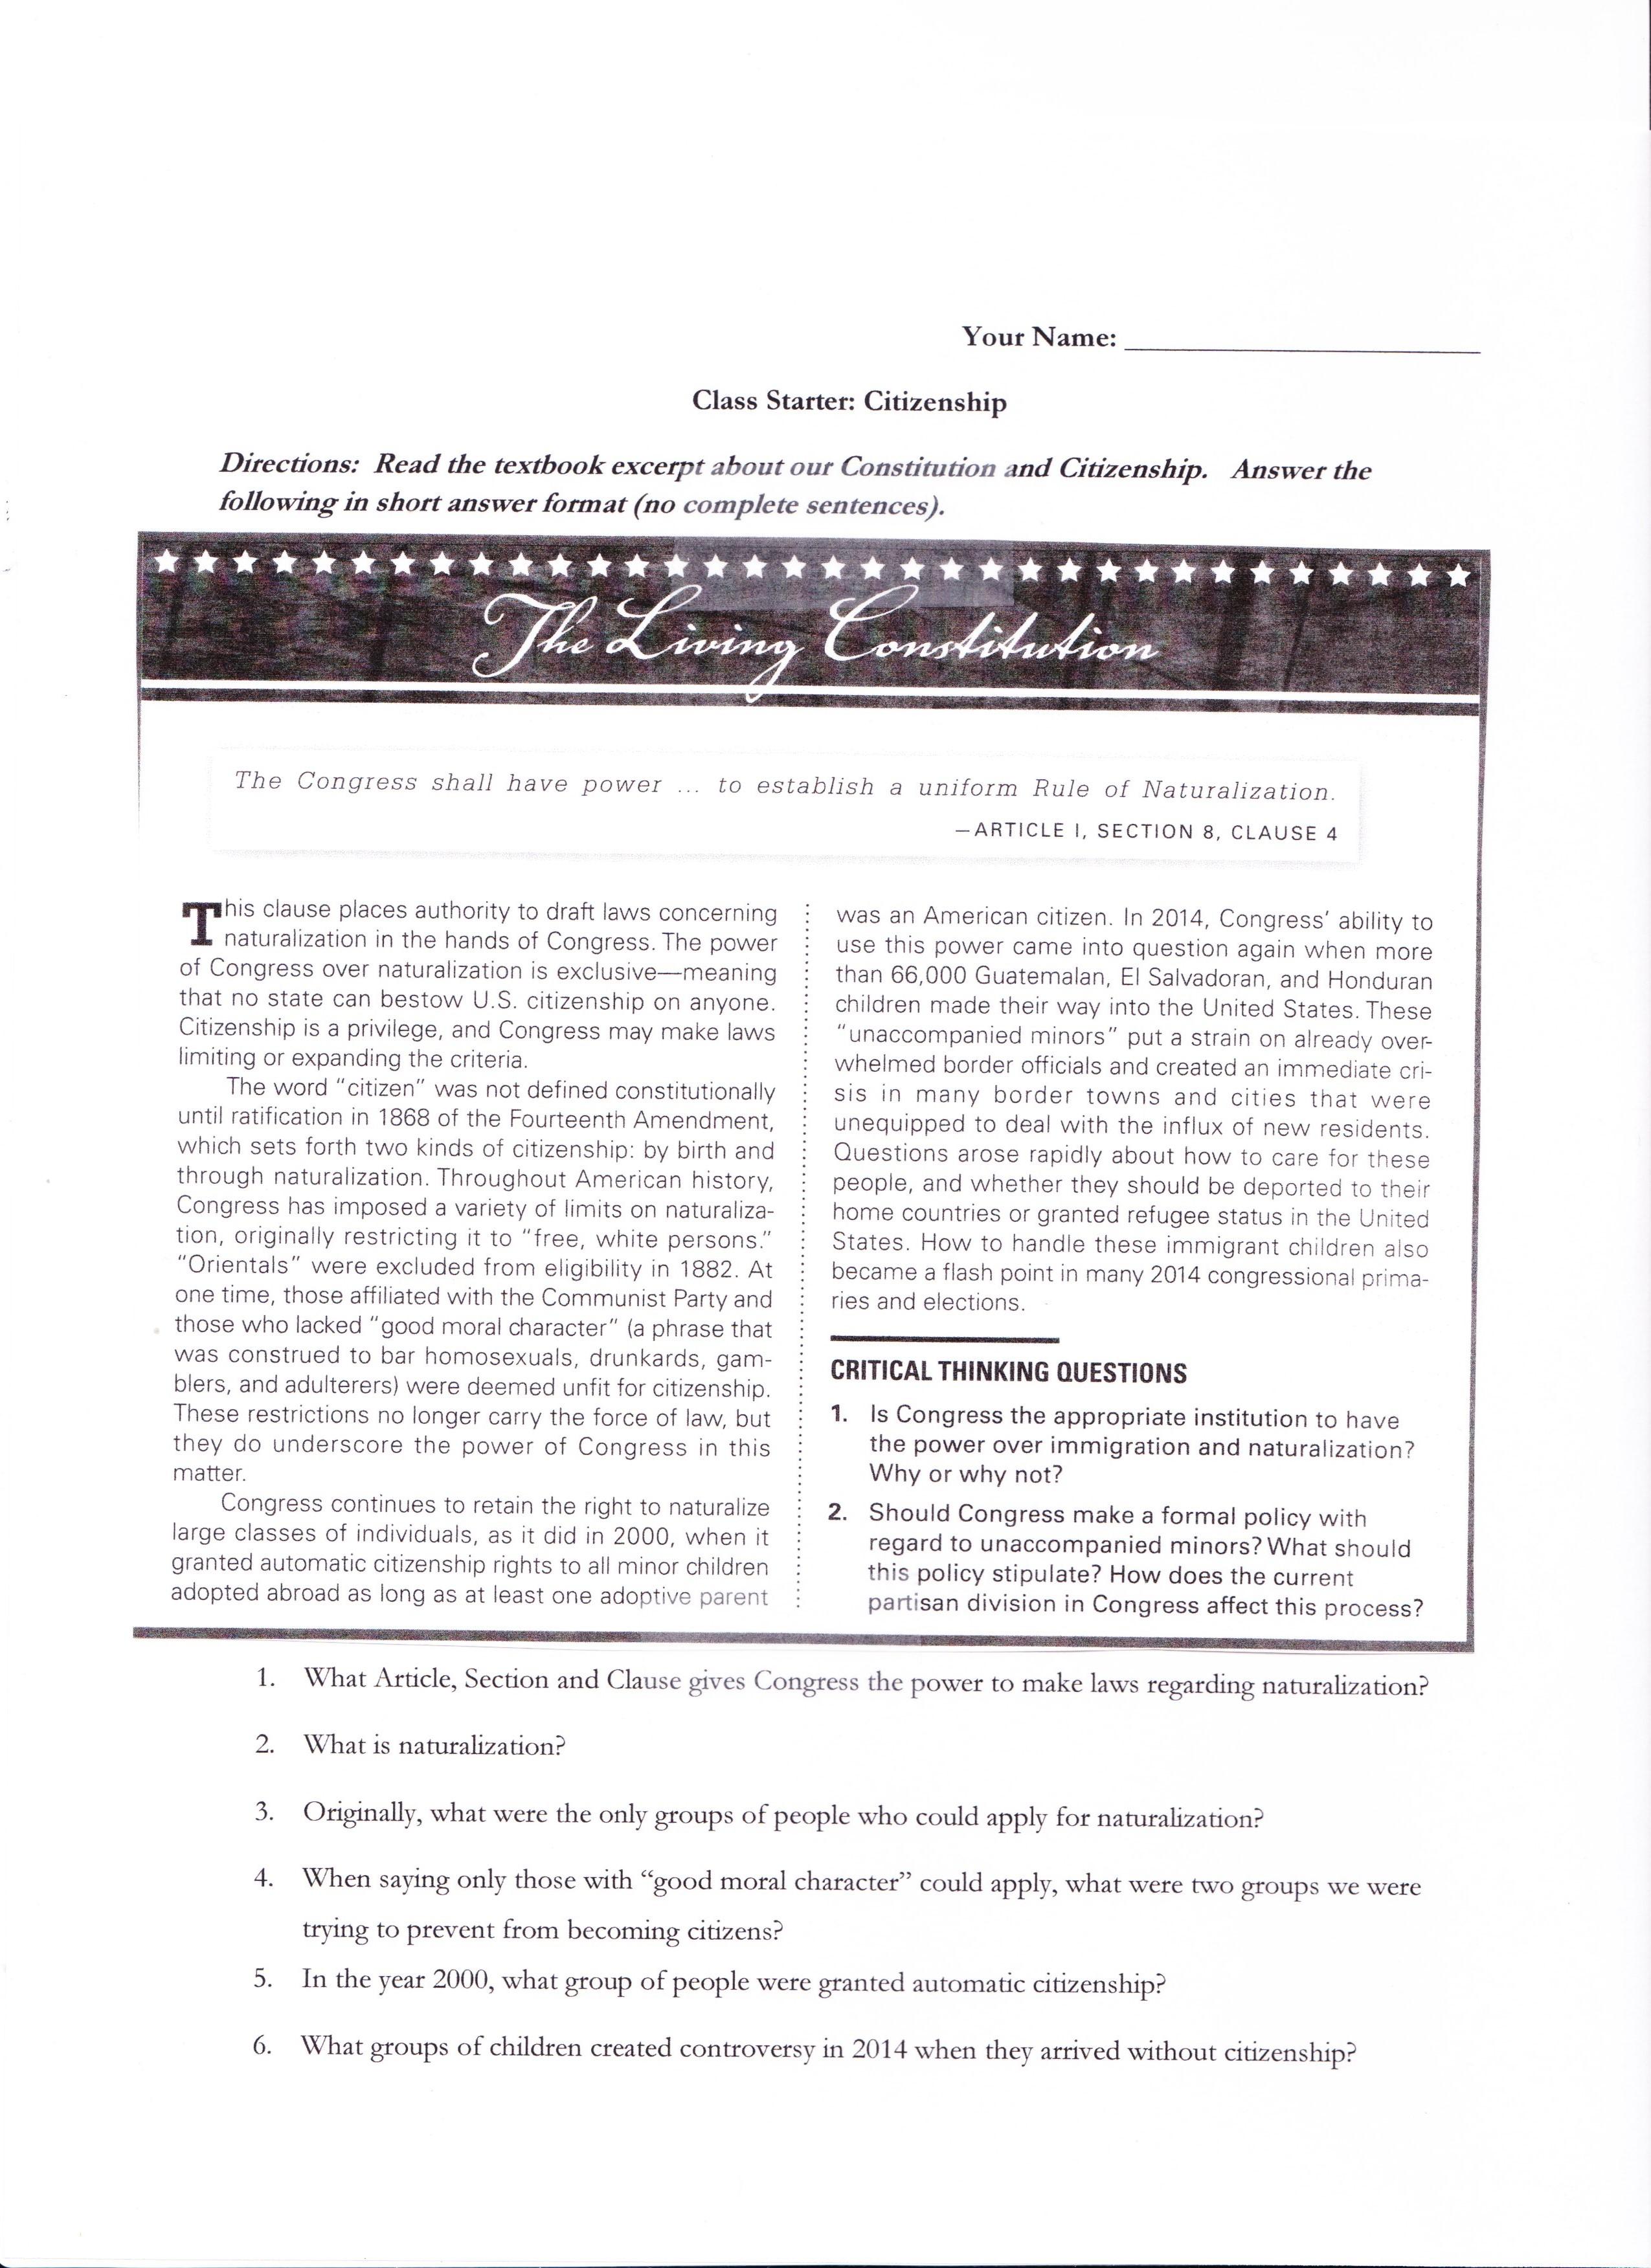 Worksheet Freakonomics Movie Worksheet Answers Carlos Lomas